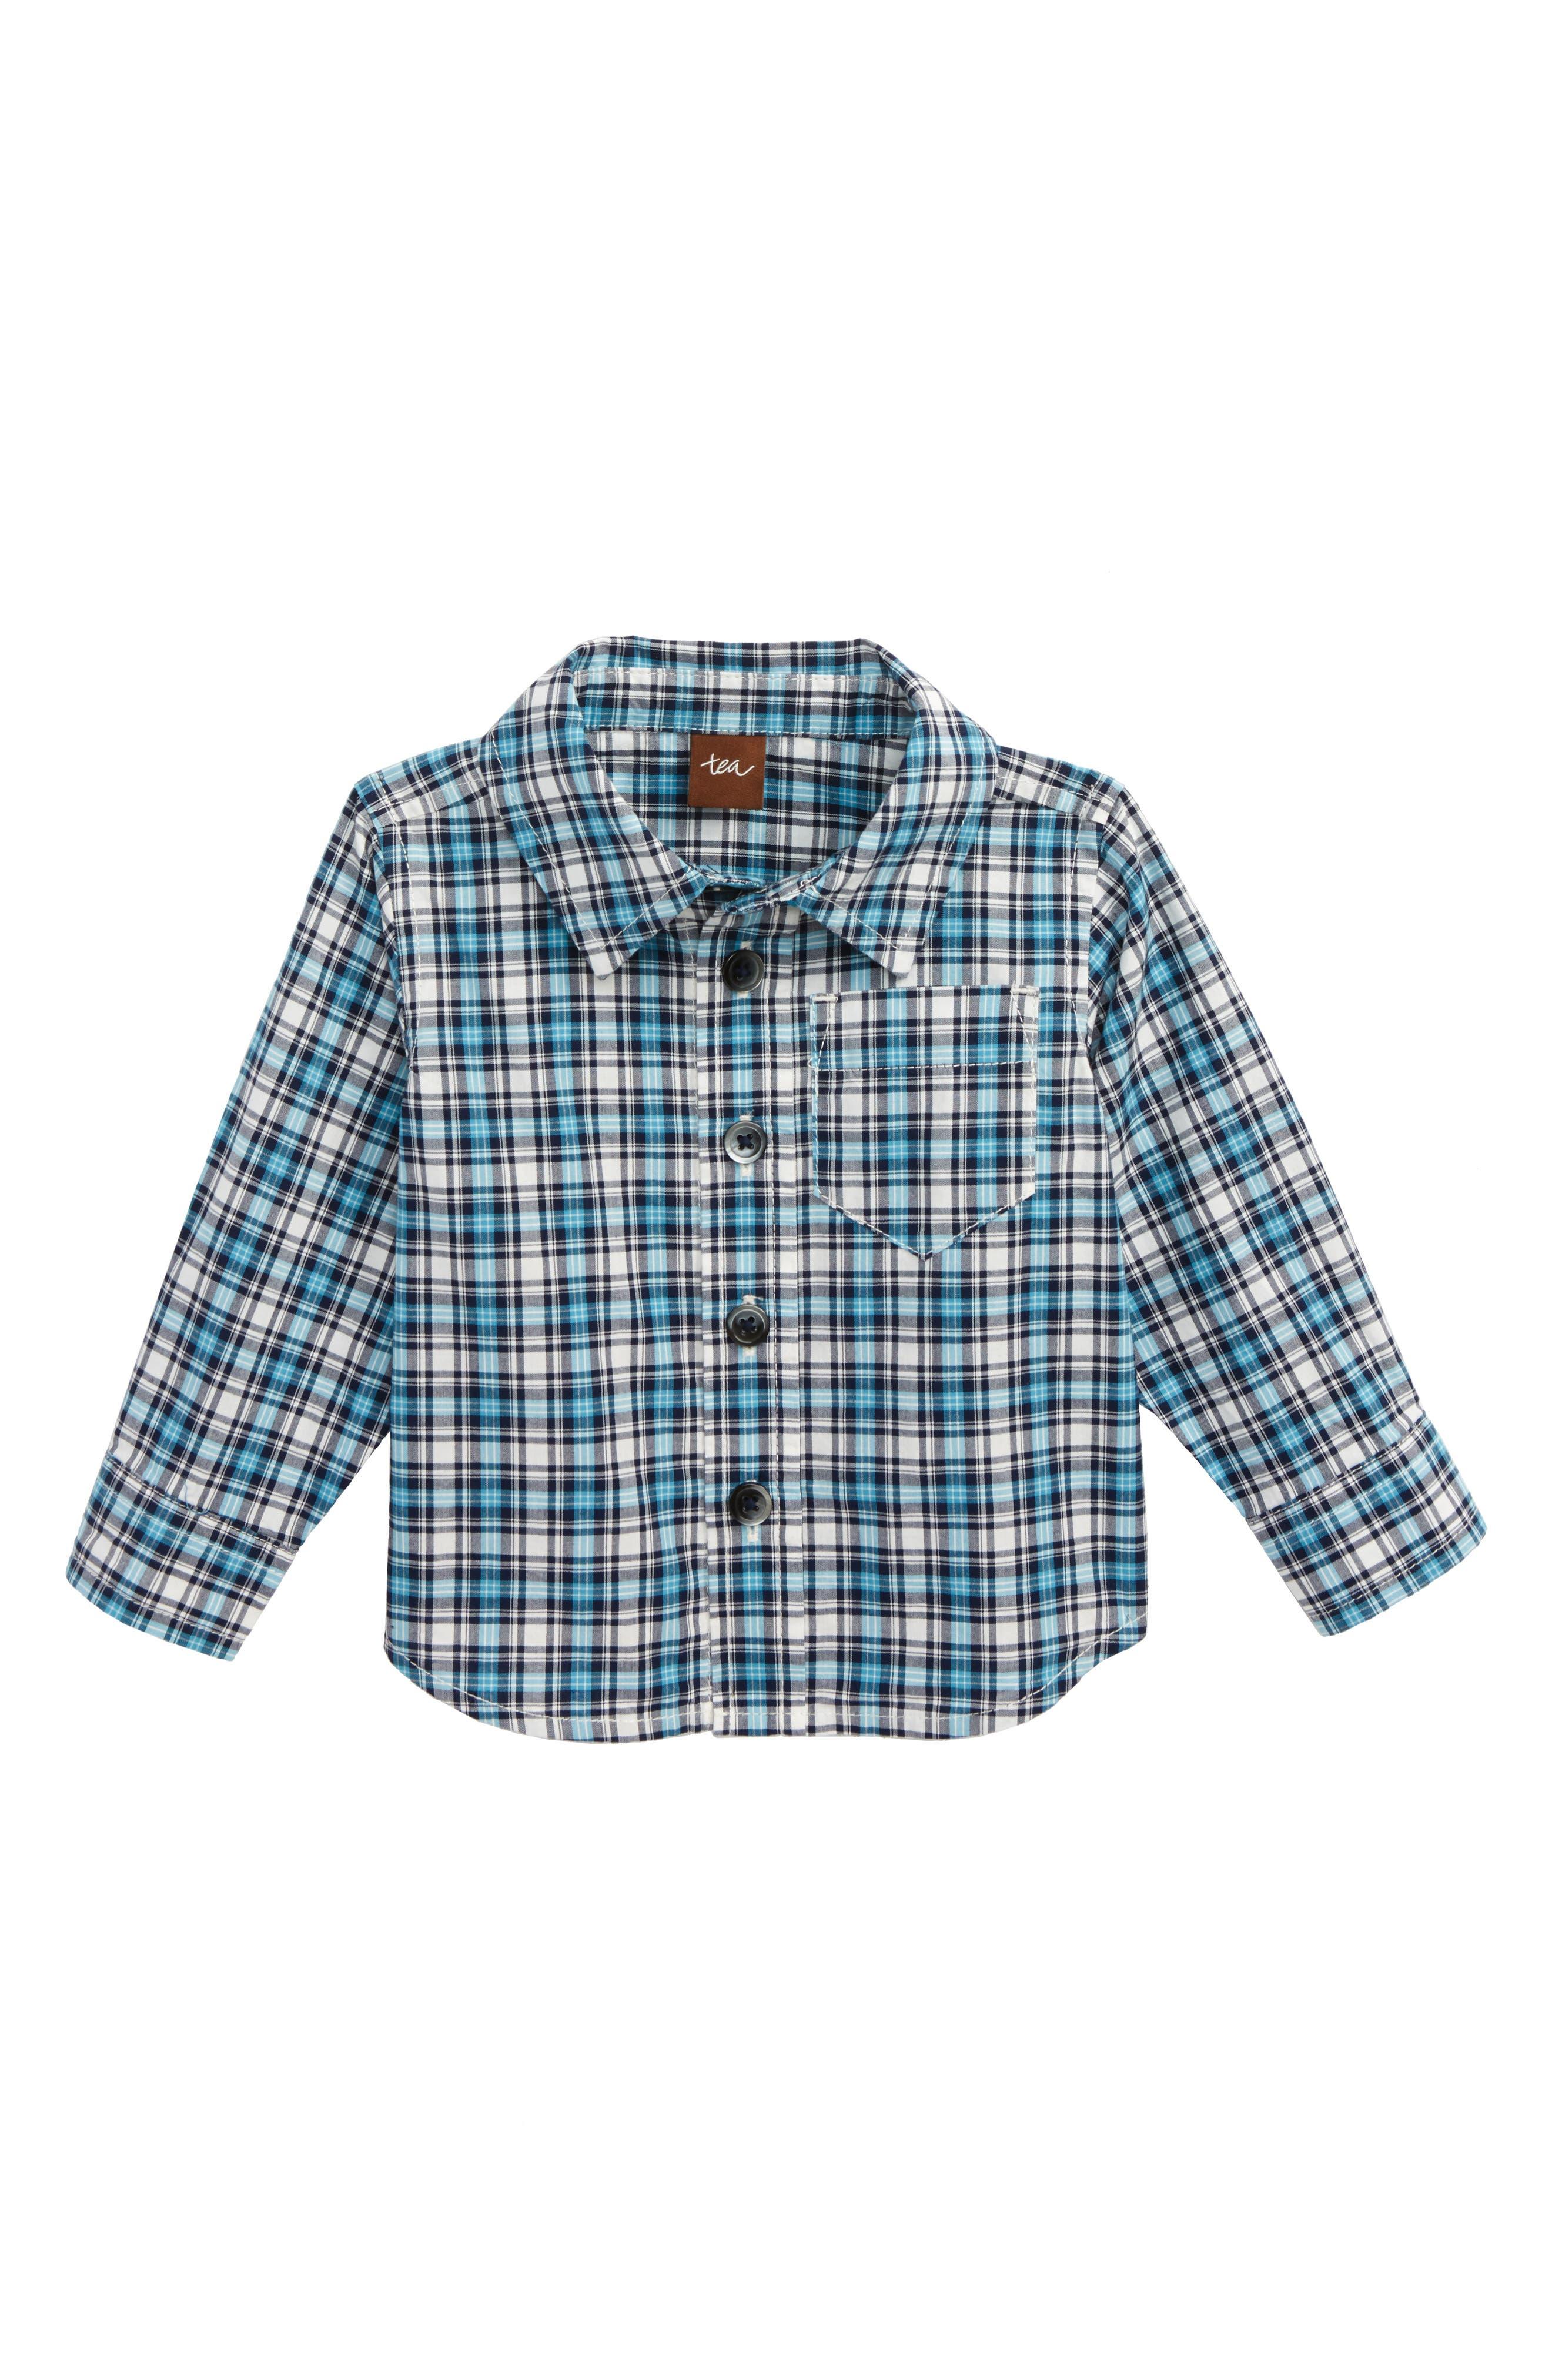 Main Image - Tea Collection Heath Plaid Woven Shirt (Baby Boys)